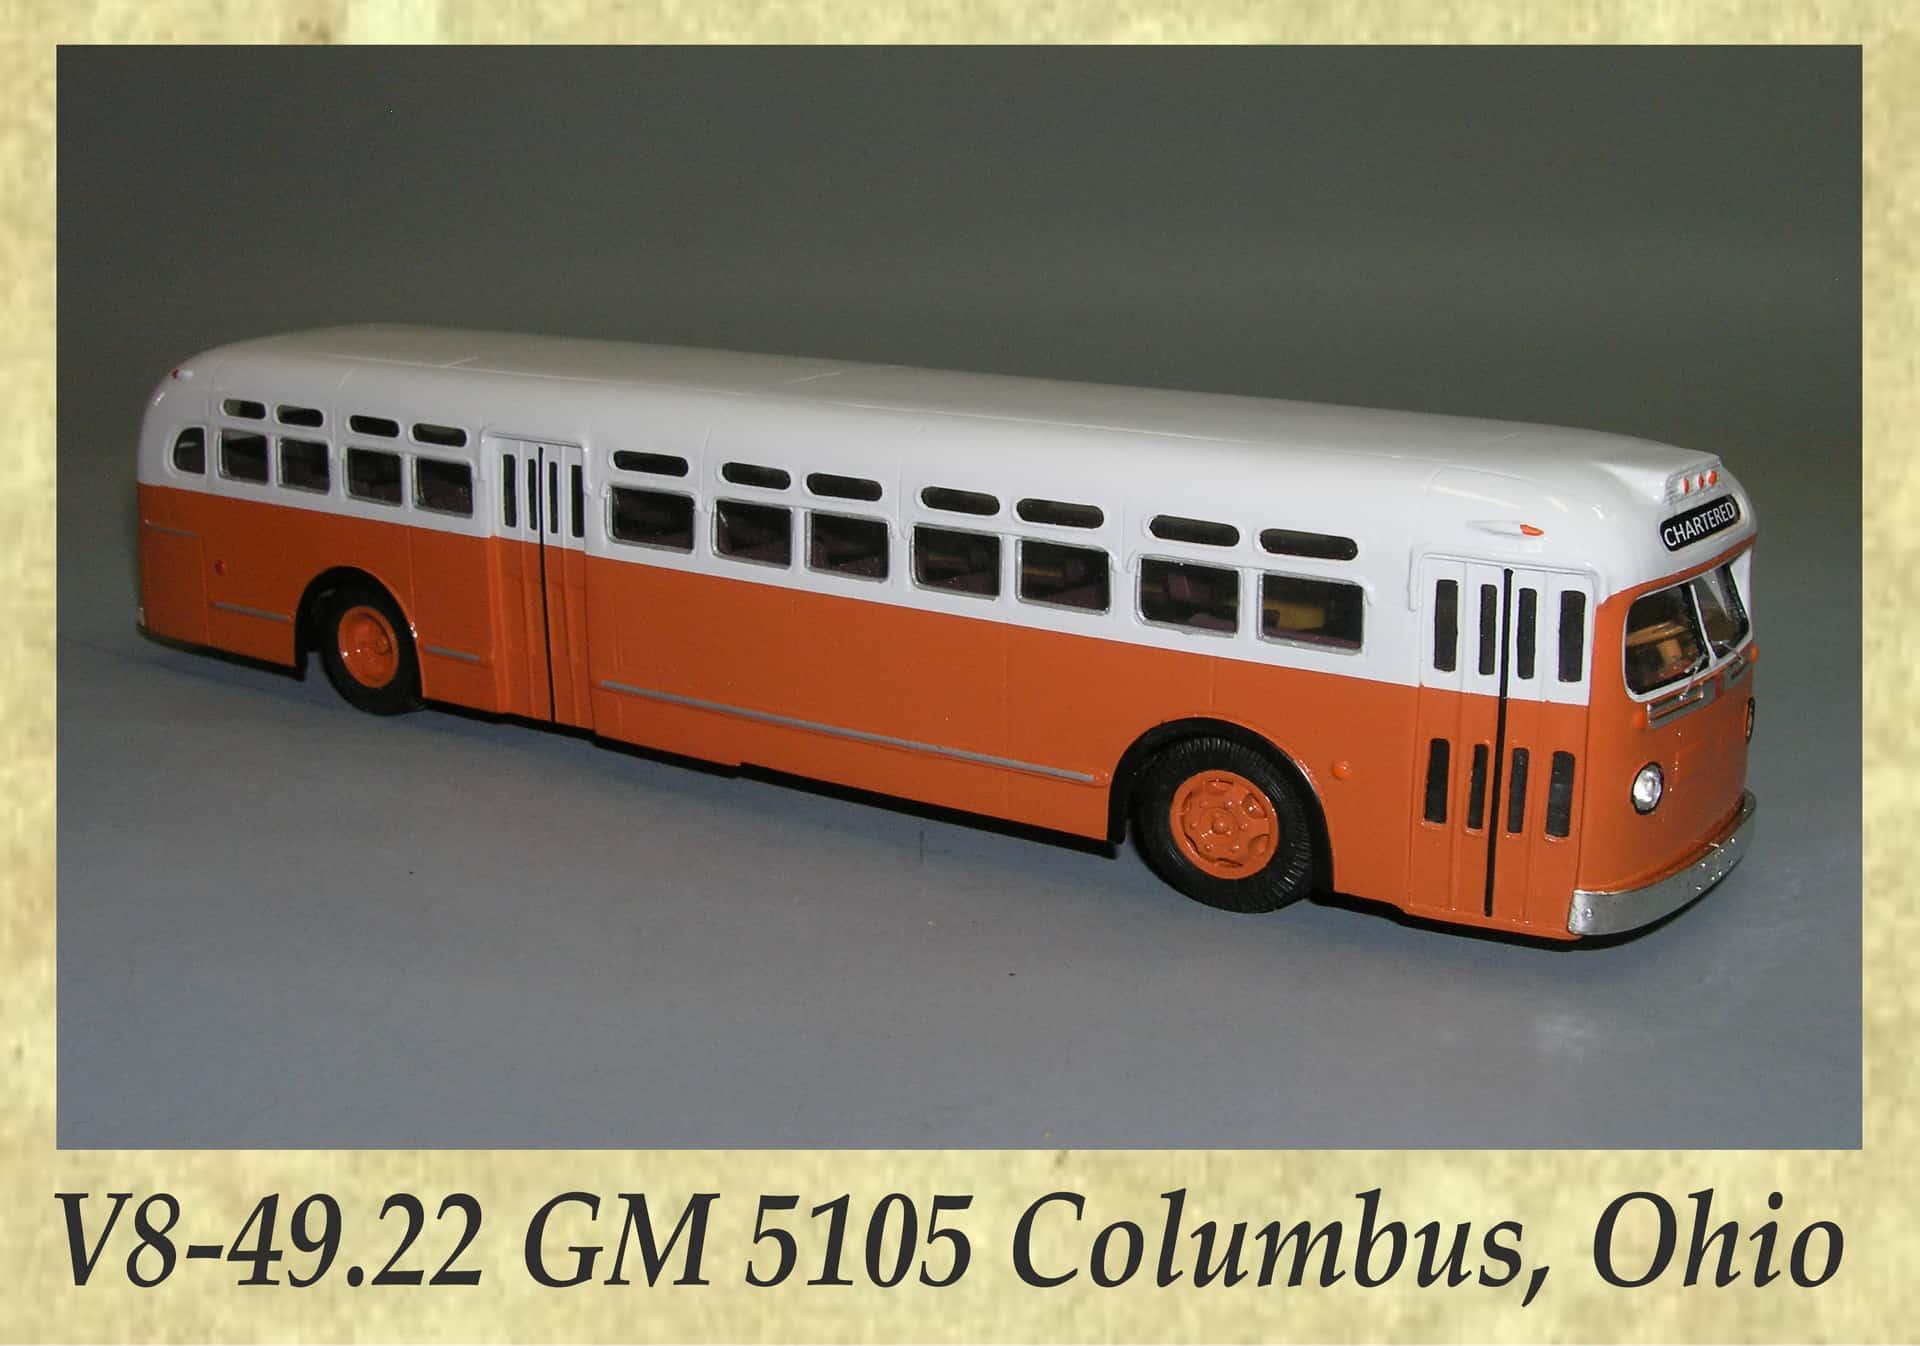 V8-49.22 GM 5105 Columbus, Ohio